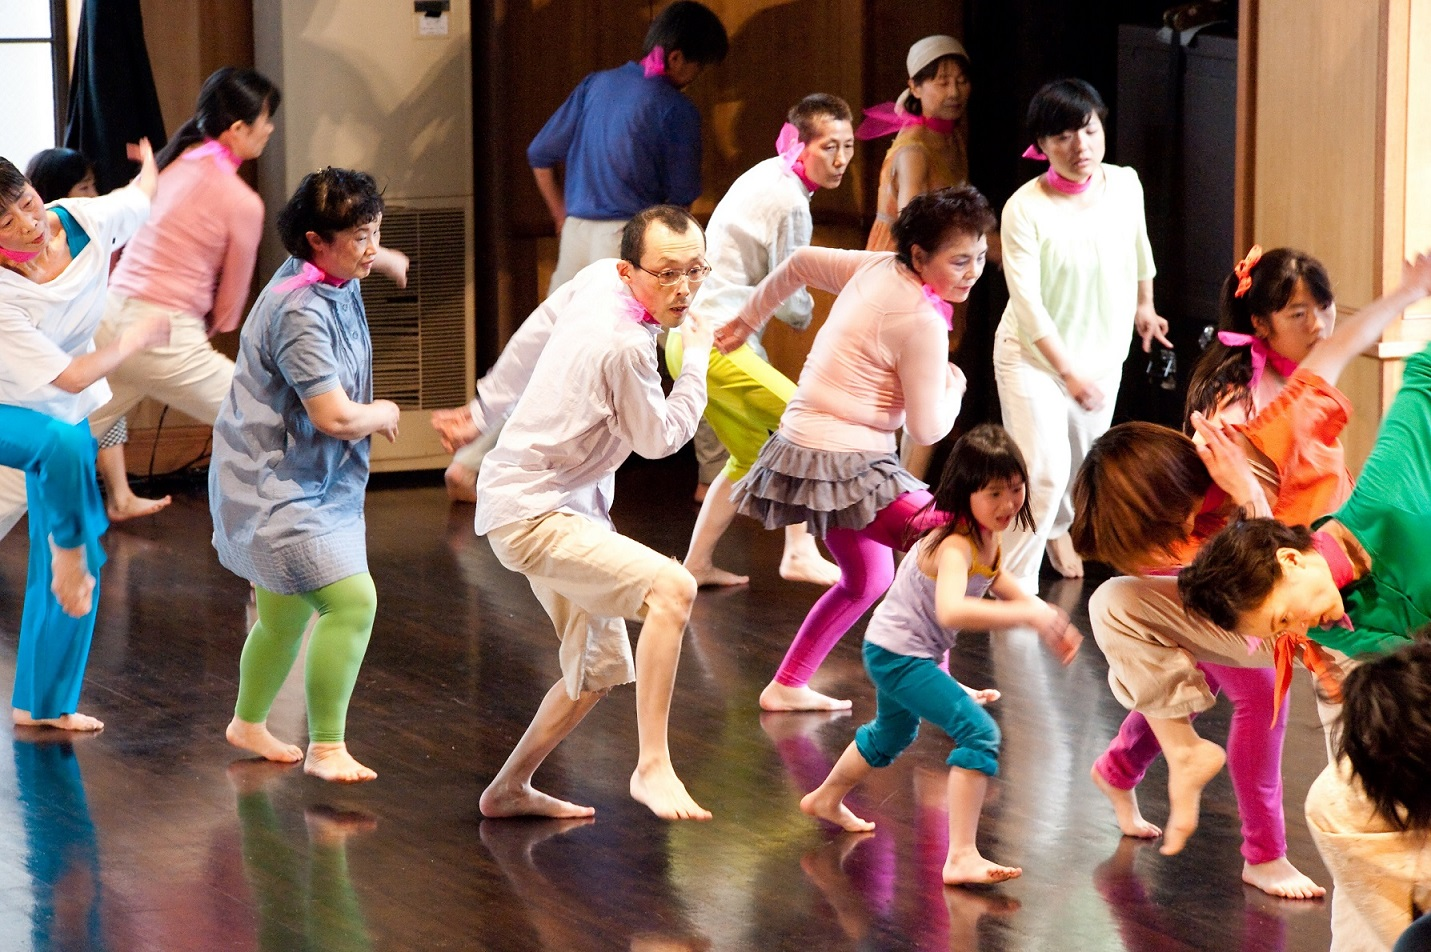 Dance 4 All 2012 『ひとつの明るい建物』 撮影:草本利枝